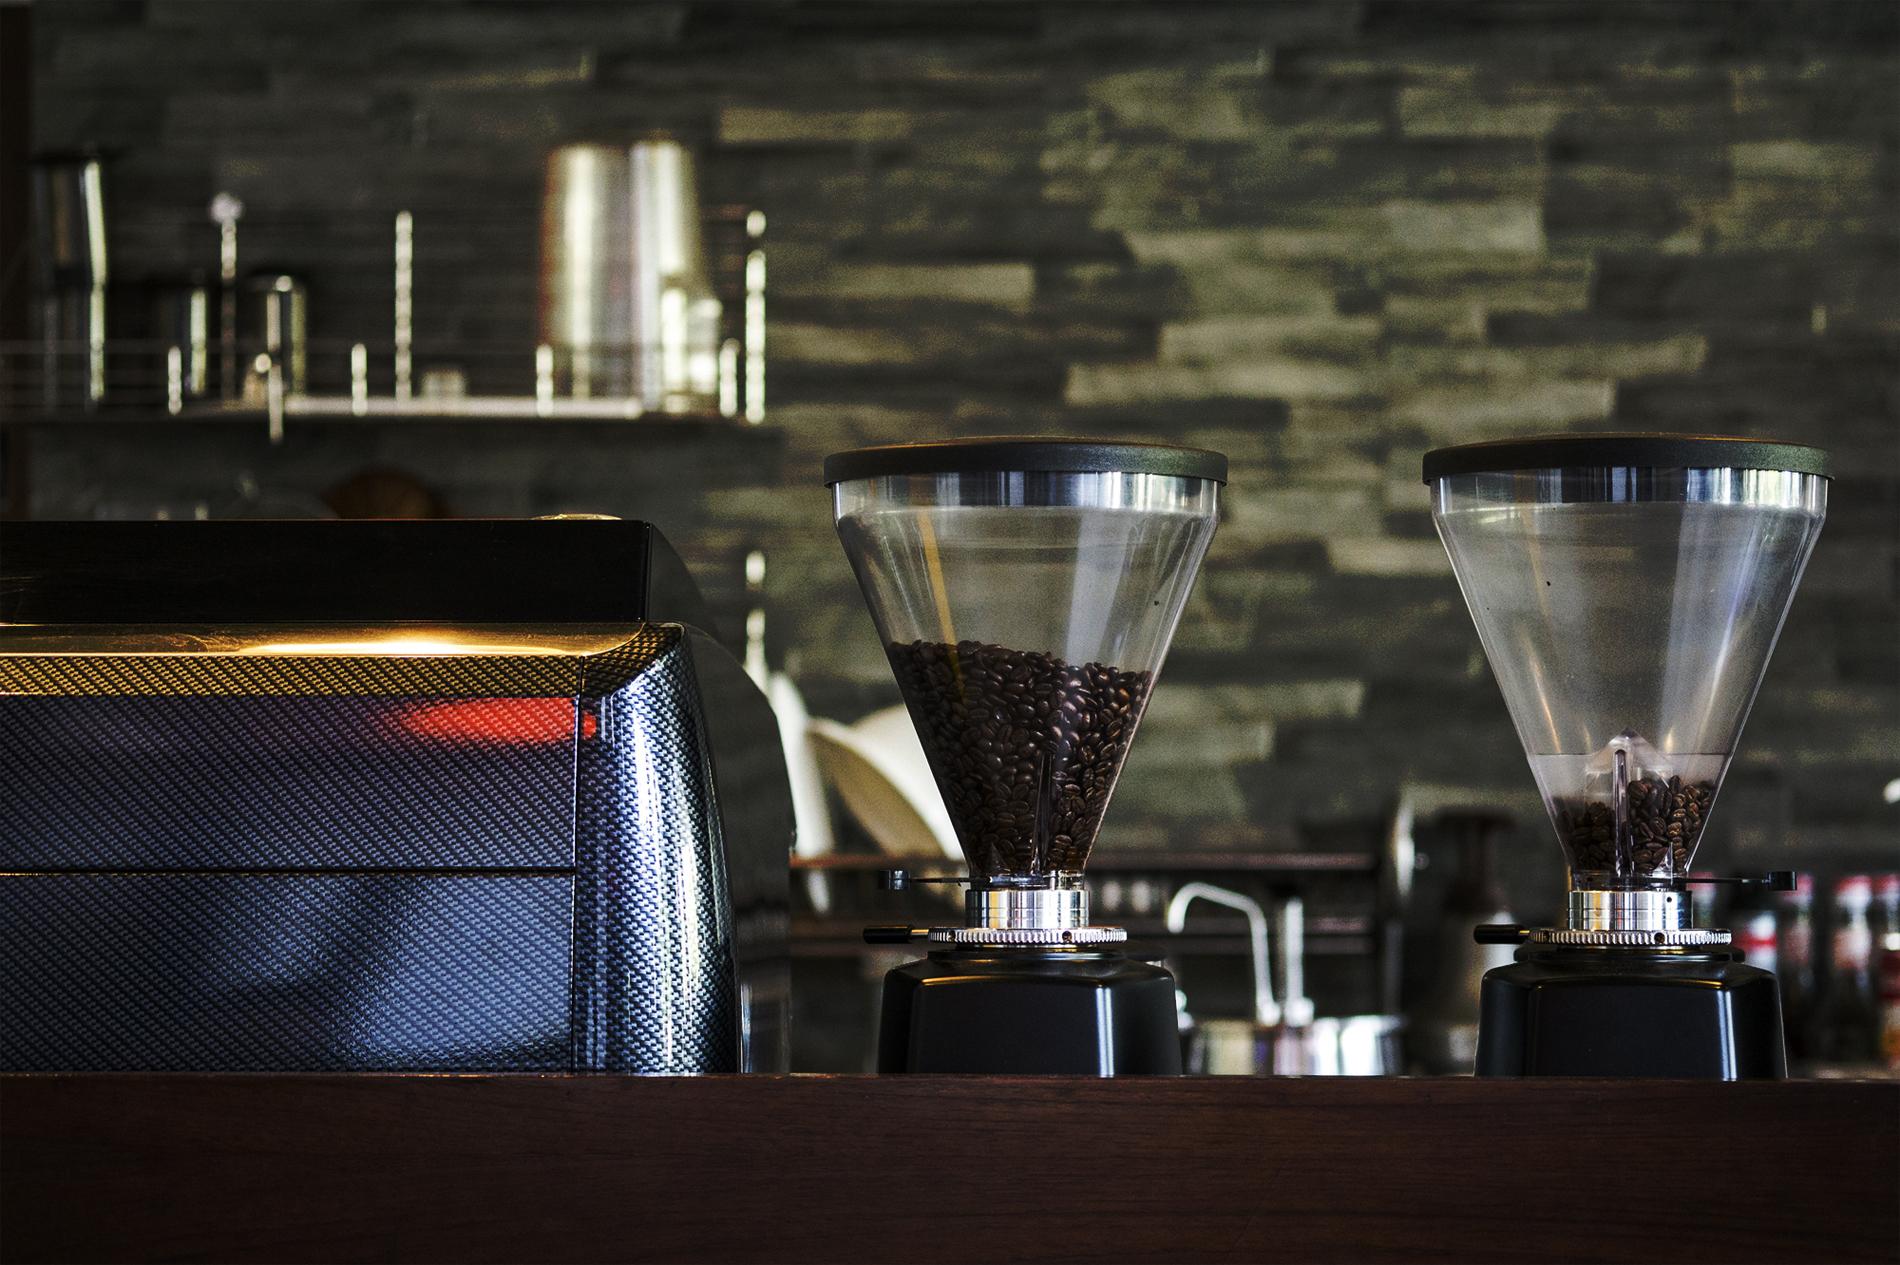 Interior coffee shop with coffee machine